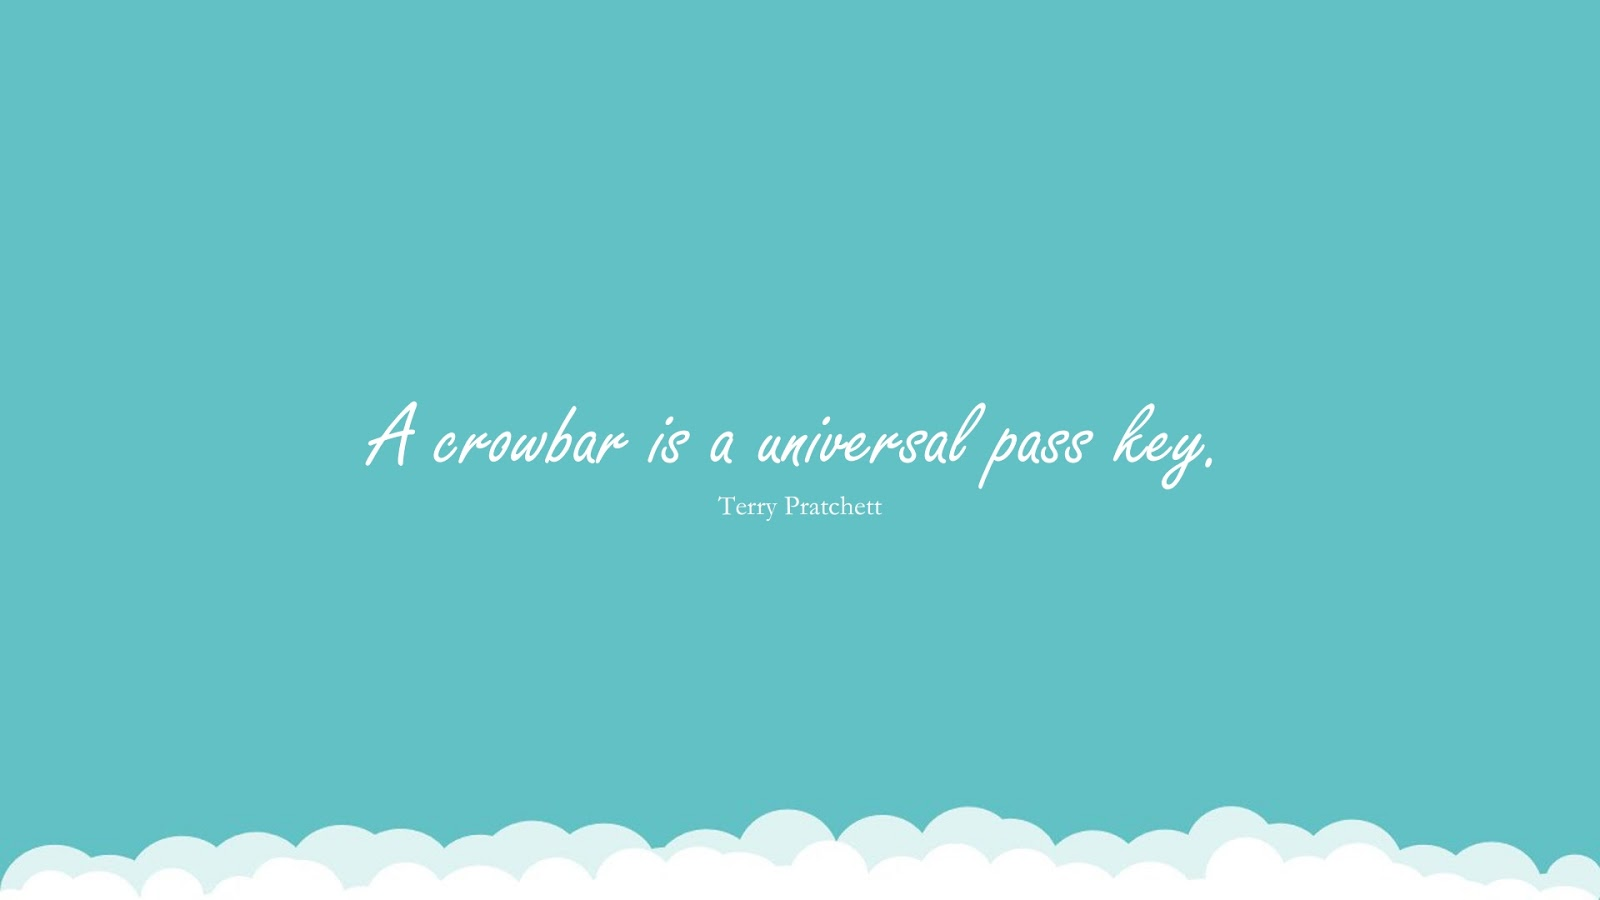 A crowbar is a universal pass key. (Terry Pratchett);  #PerseveranceQuotes